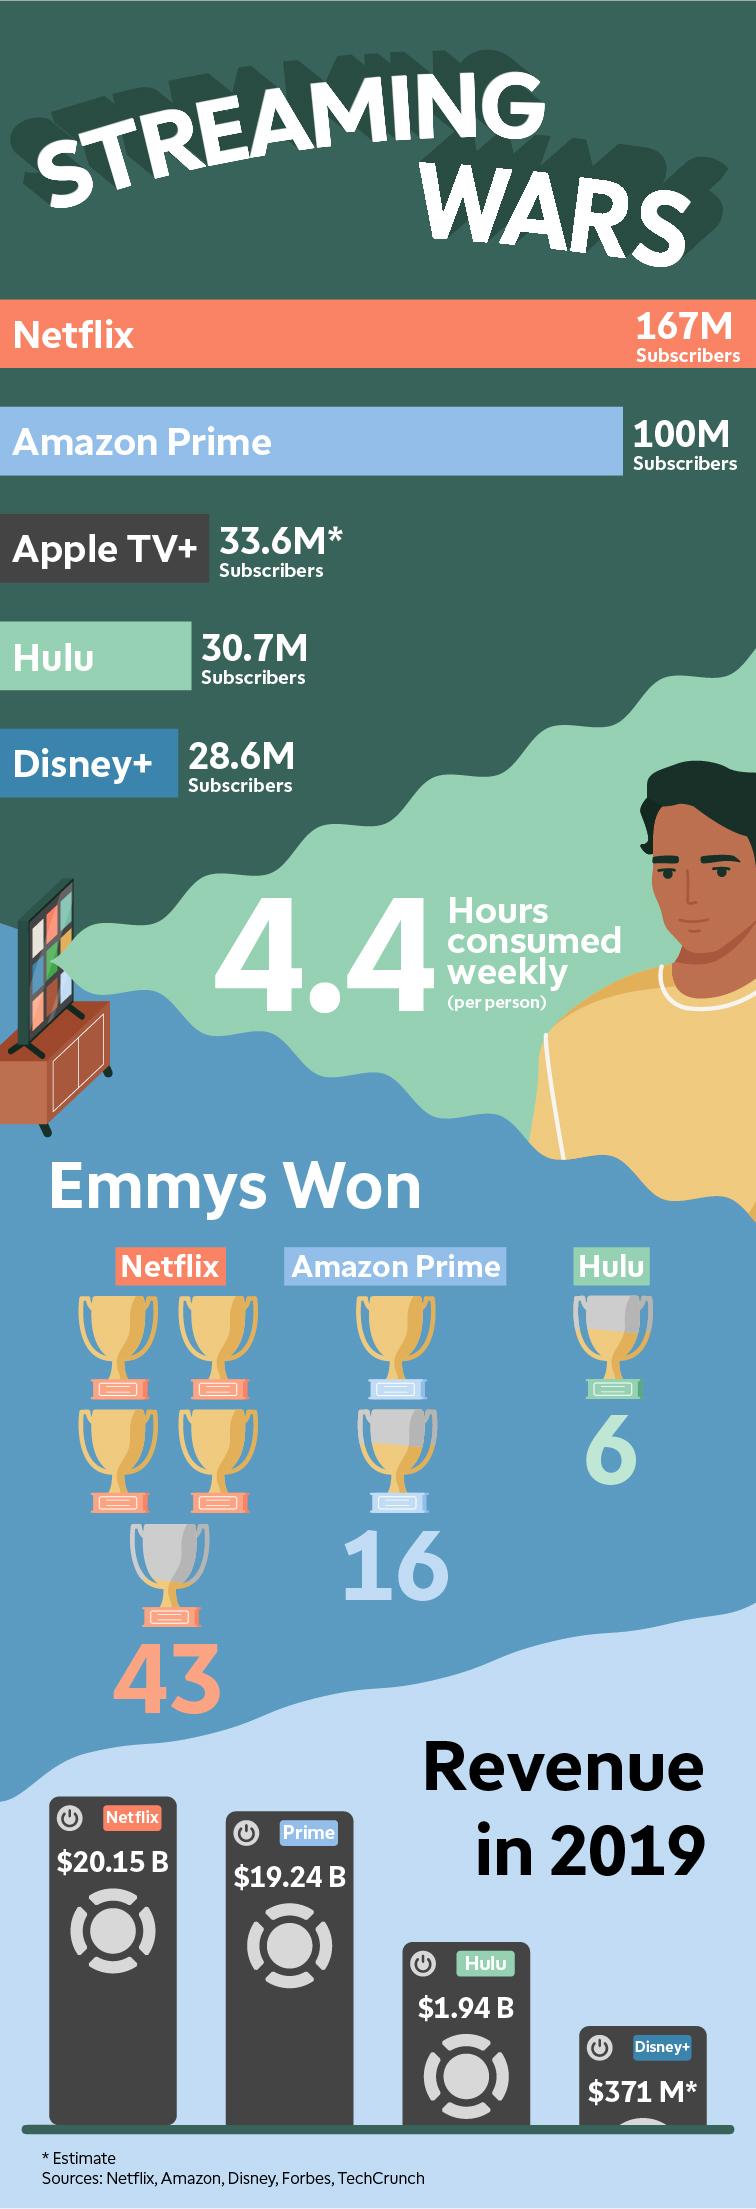 Streaming wars: Netflix, Amazon, Apple, Hulu, Disney